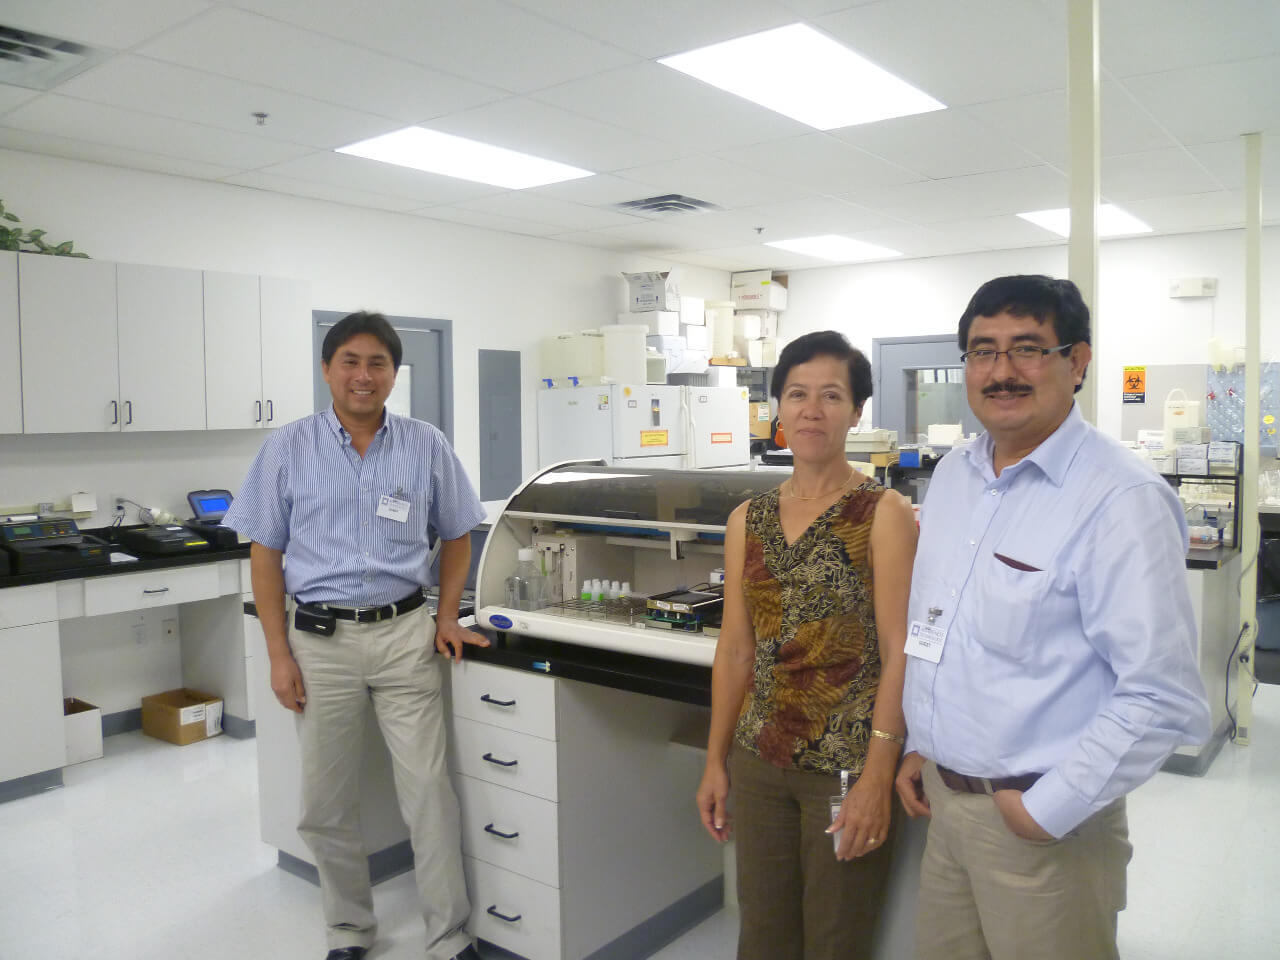 equipos-de-laboratorio-clinico-awareness-technology